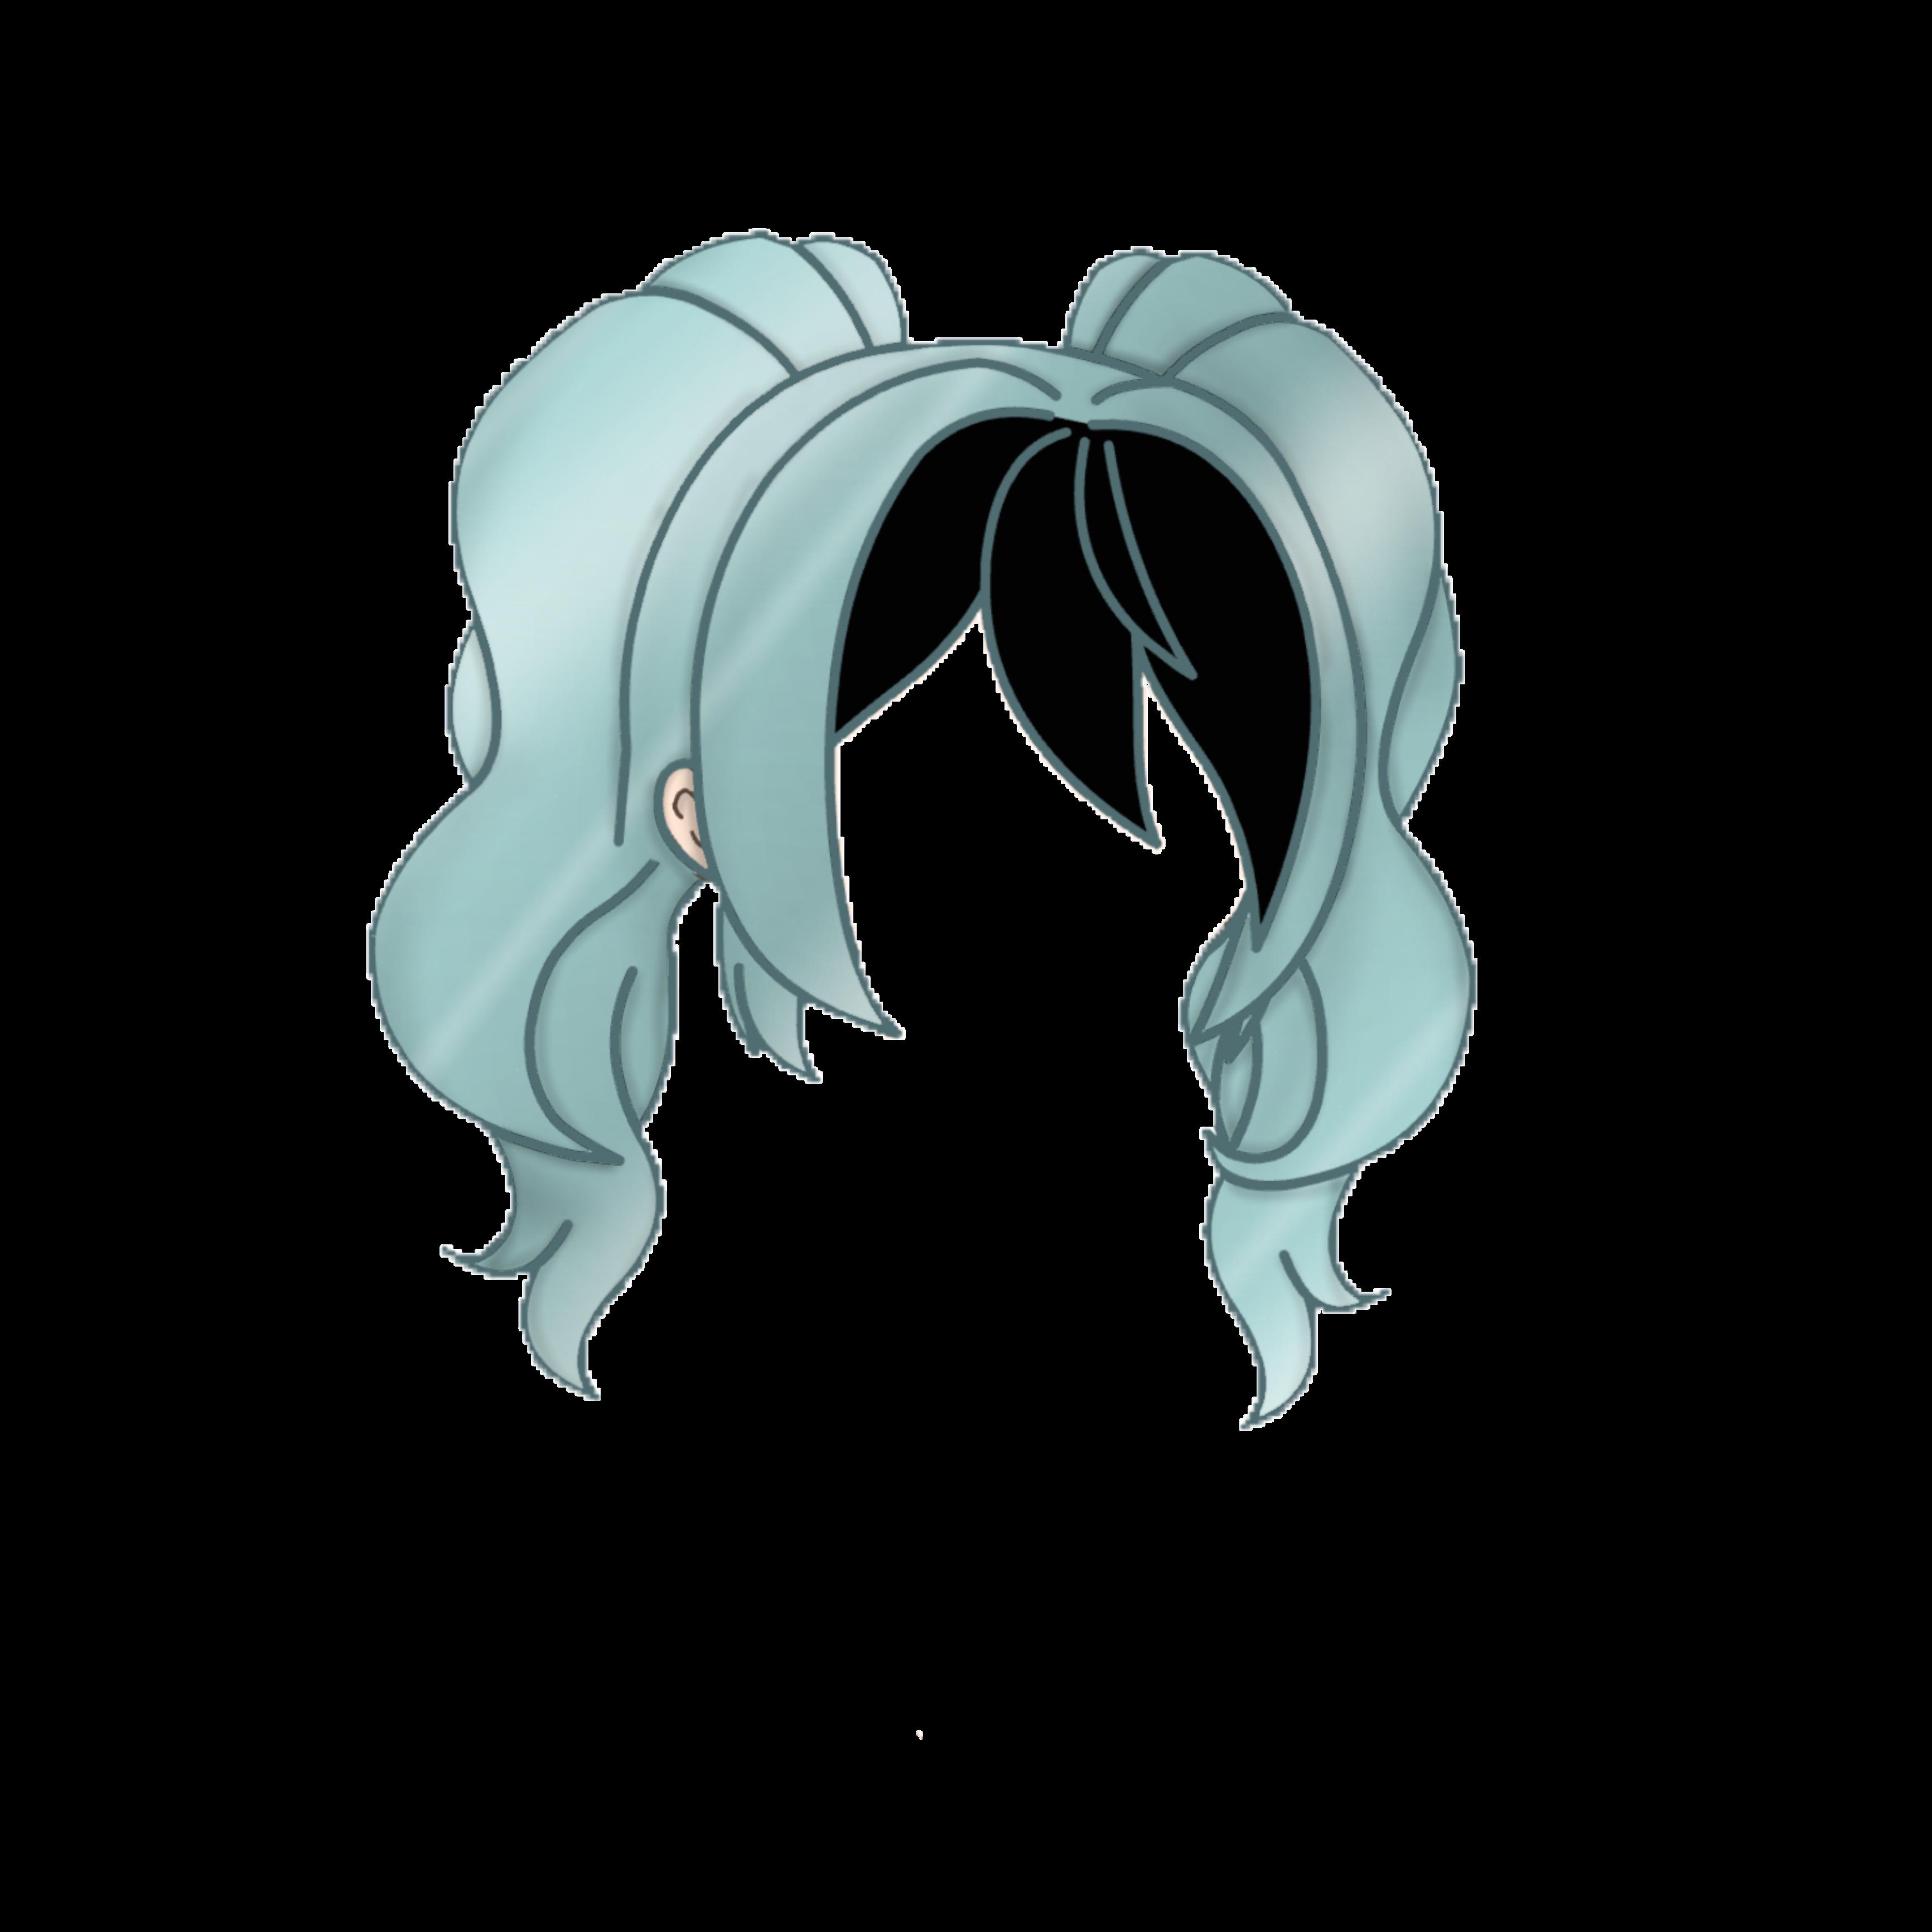 Anime Girl Hair Colors: Gacha Gachalife Hair Hairstyle Gachahaur Girlhair Freet